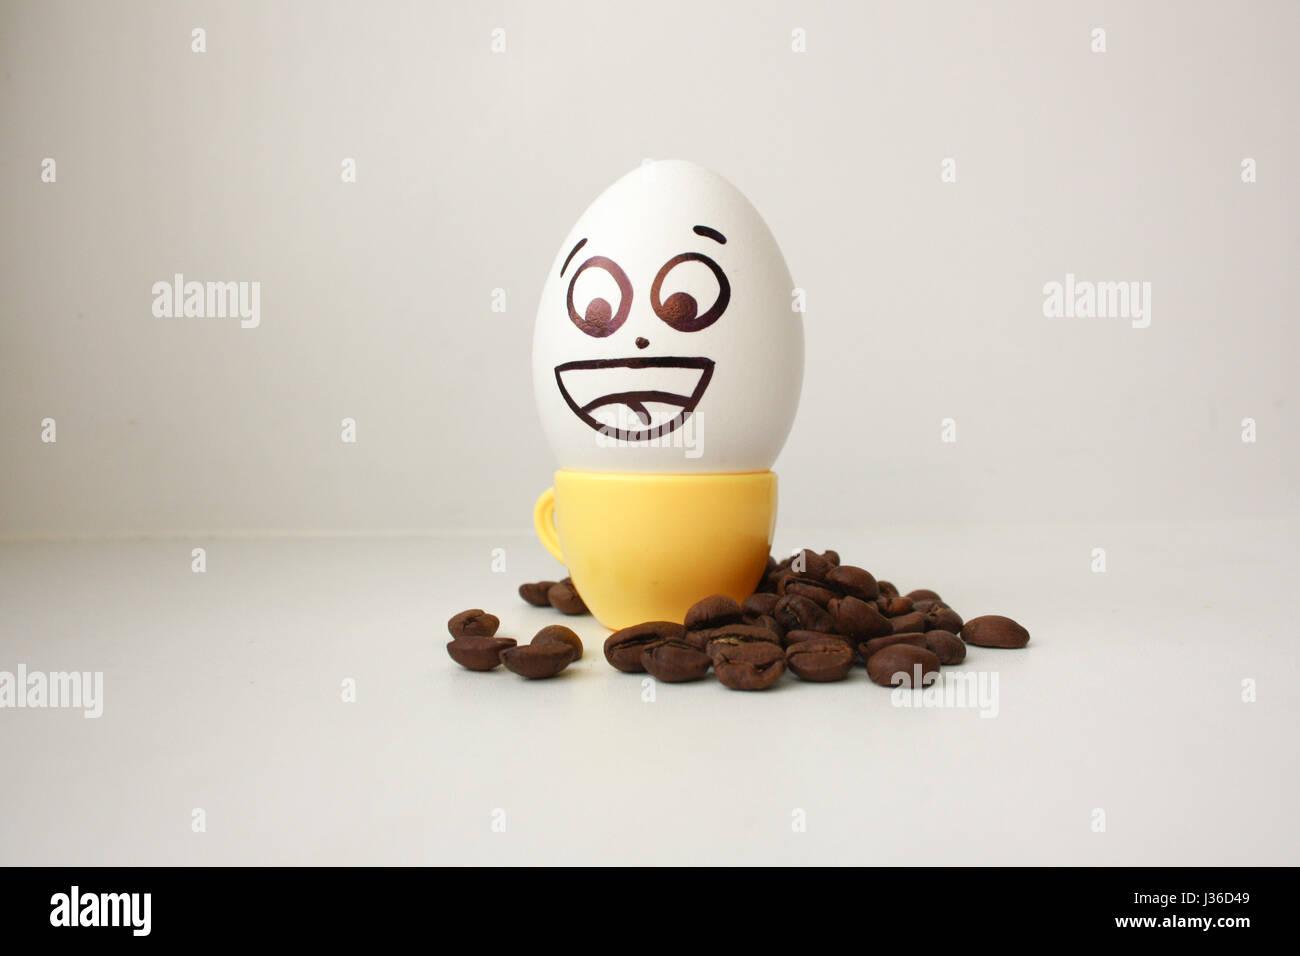 Smiley Face Coffee Mug Egg Cup Face Stock Photos Egg Cup Face Stock Images Alamy